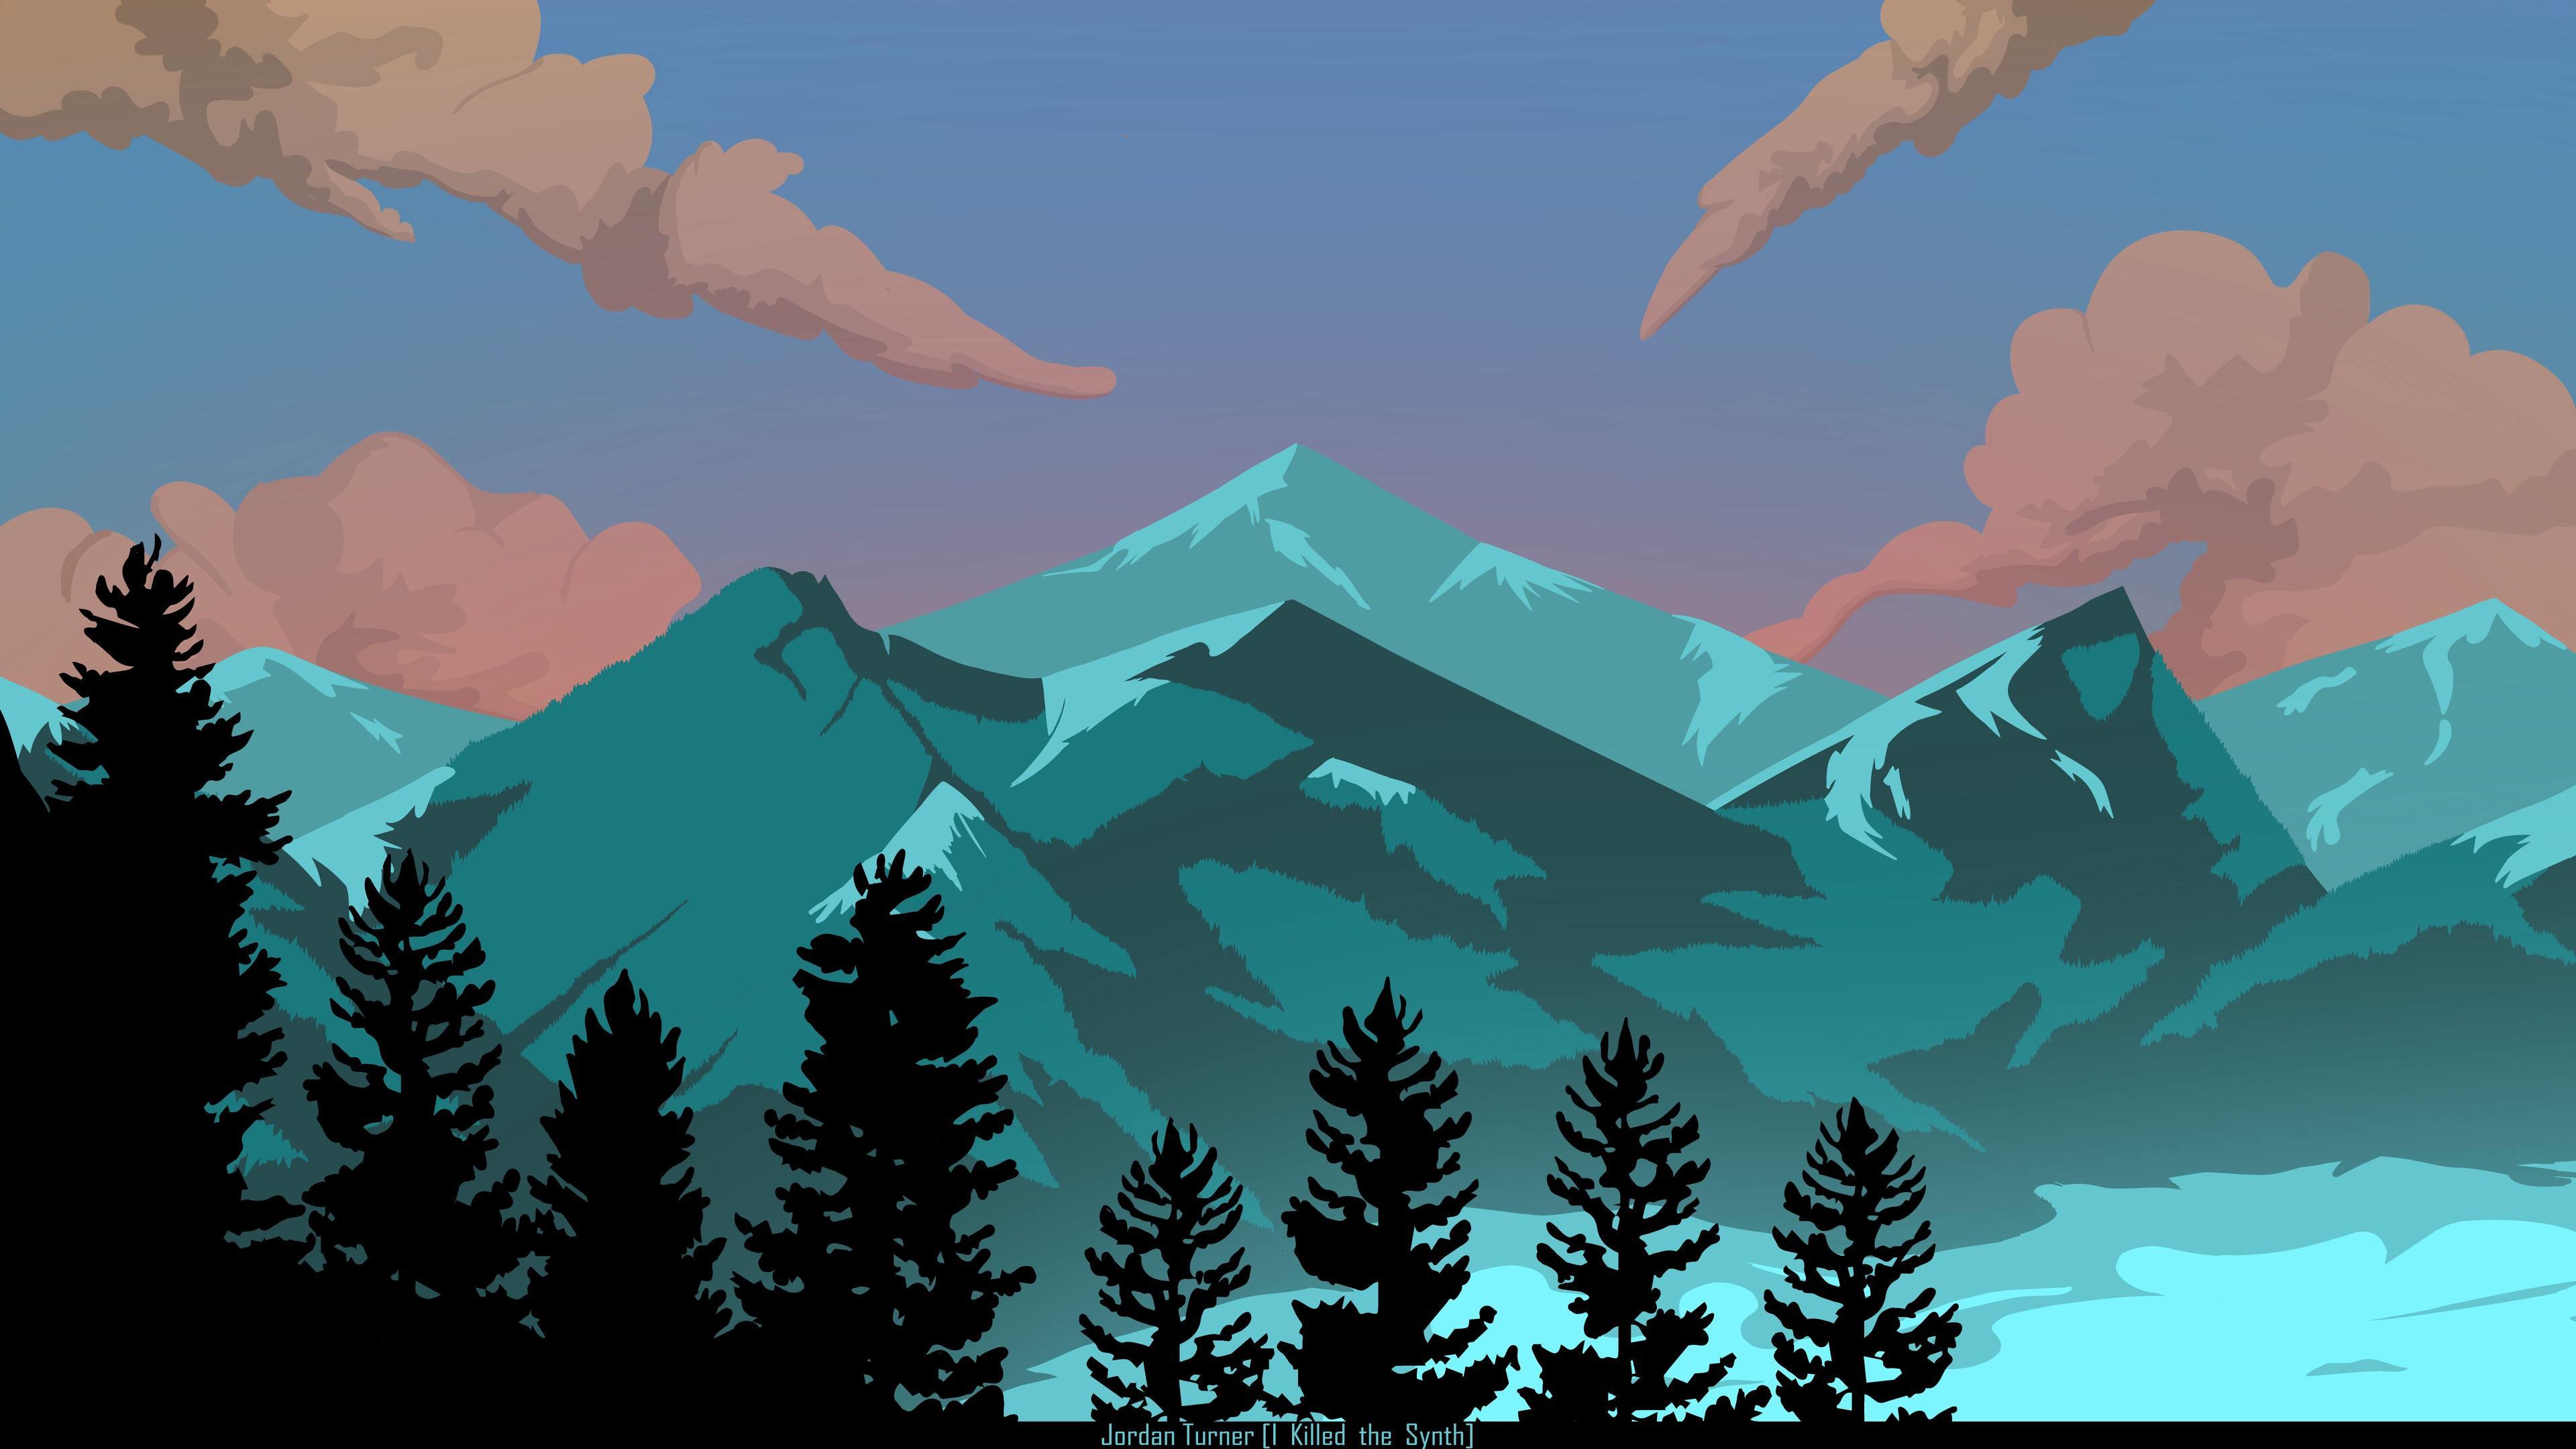 appalachia mountain 4k illustration 1540755871 - Appalachia Mountain 4k Illustration - illustration wallpapers, hd-wallpapers, digital art wallpapers, artwork wallpapers, artist wallpapers, 8k wallpapers, 4k-wallpapers